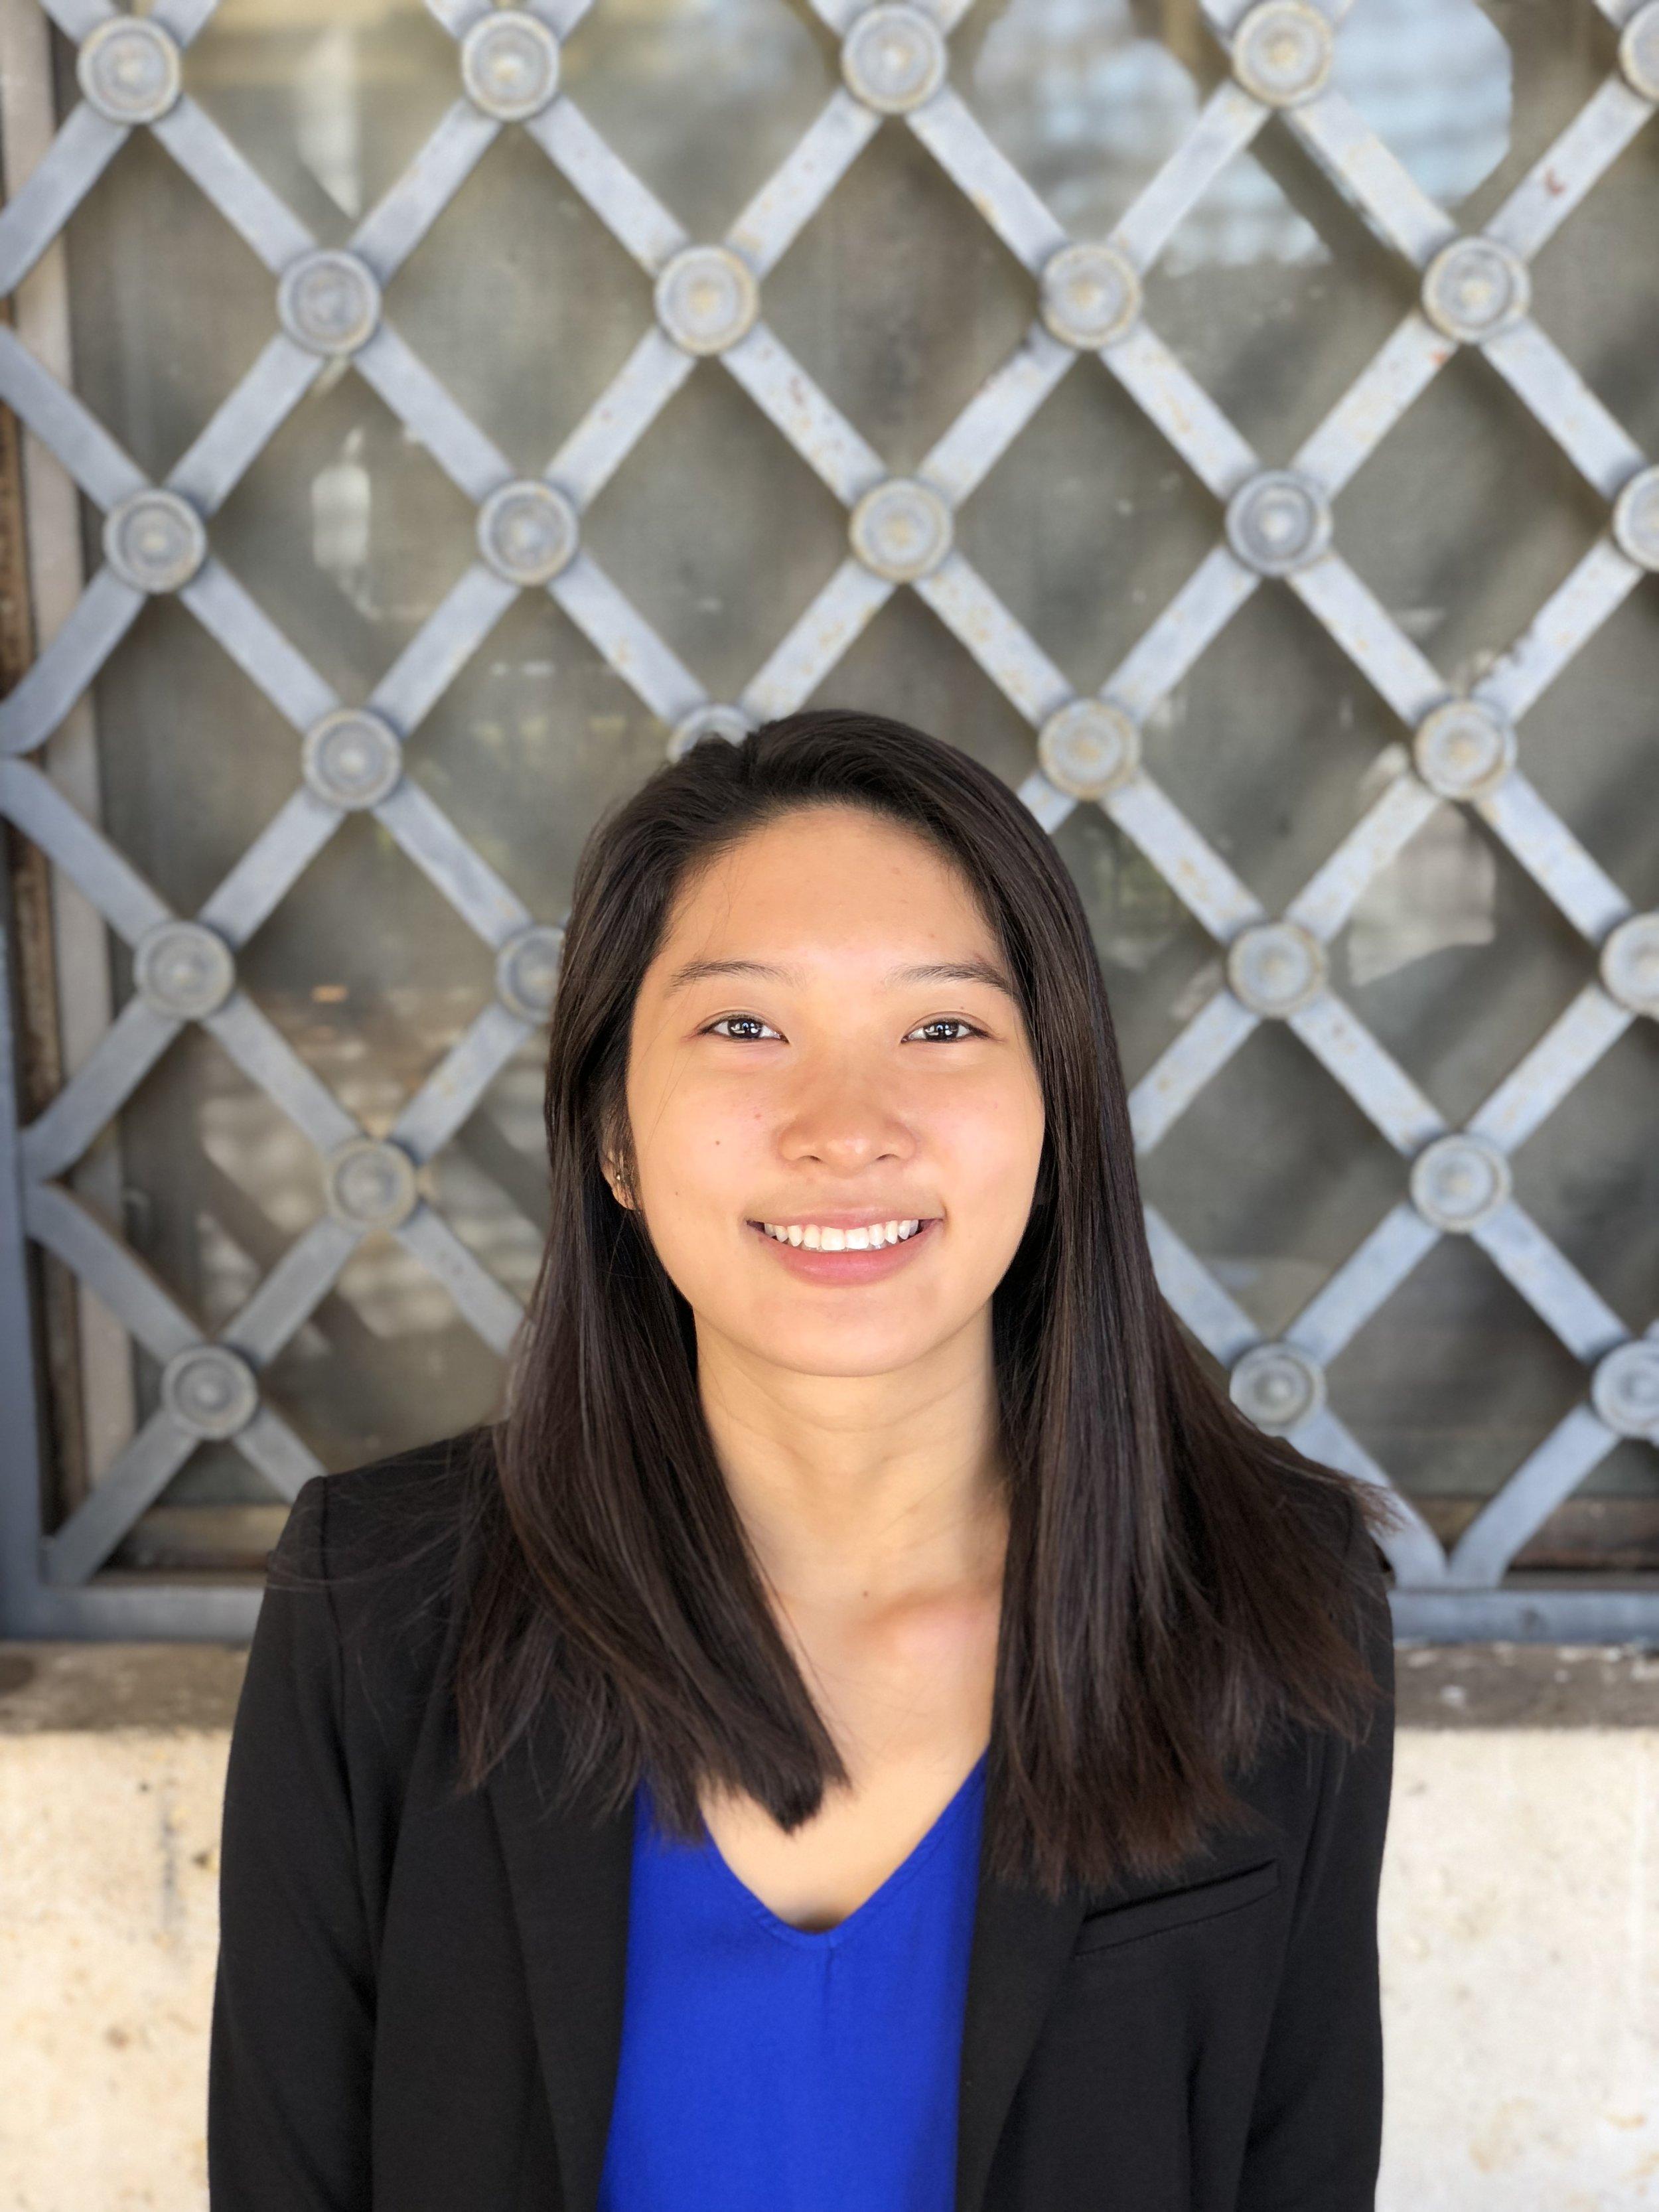 Vivian Mach, Secretary